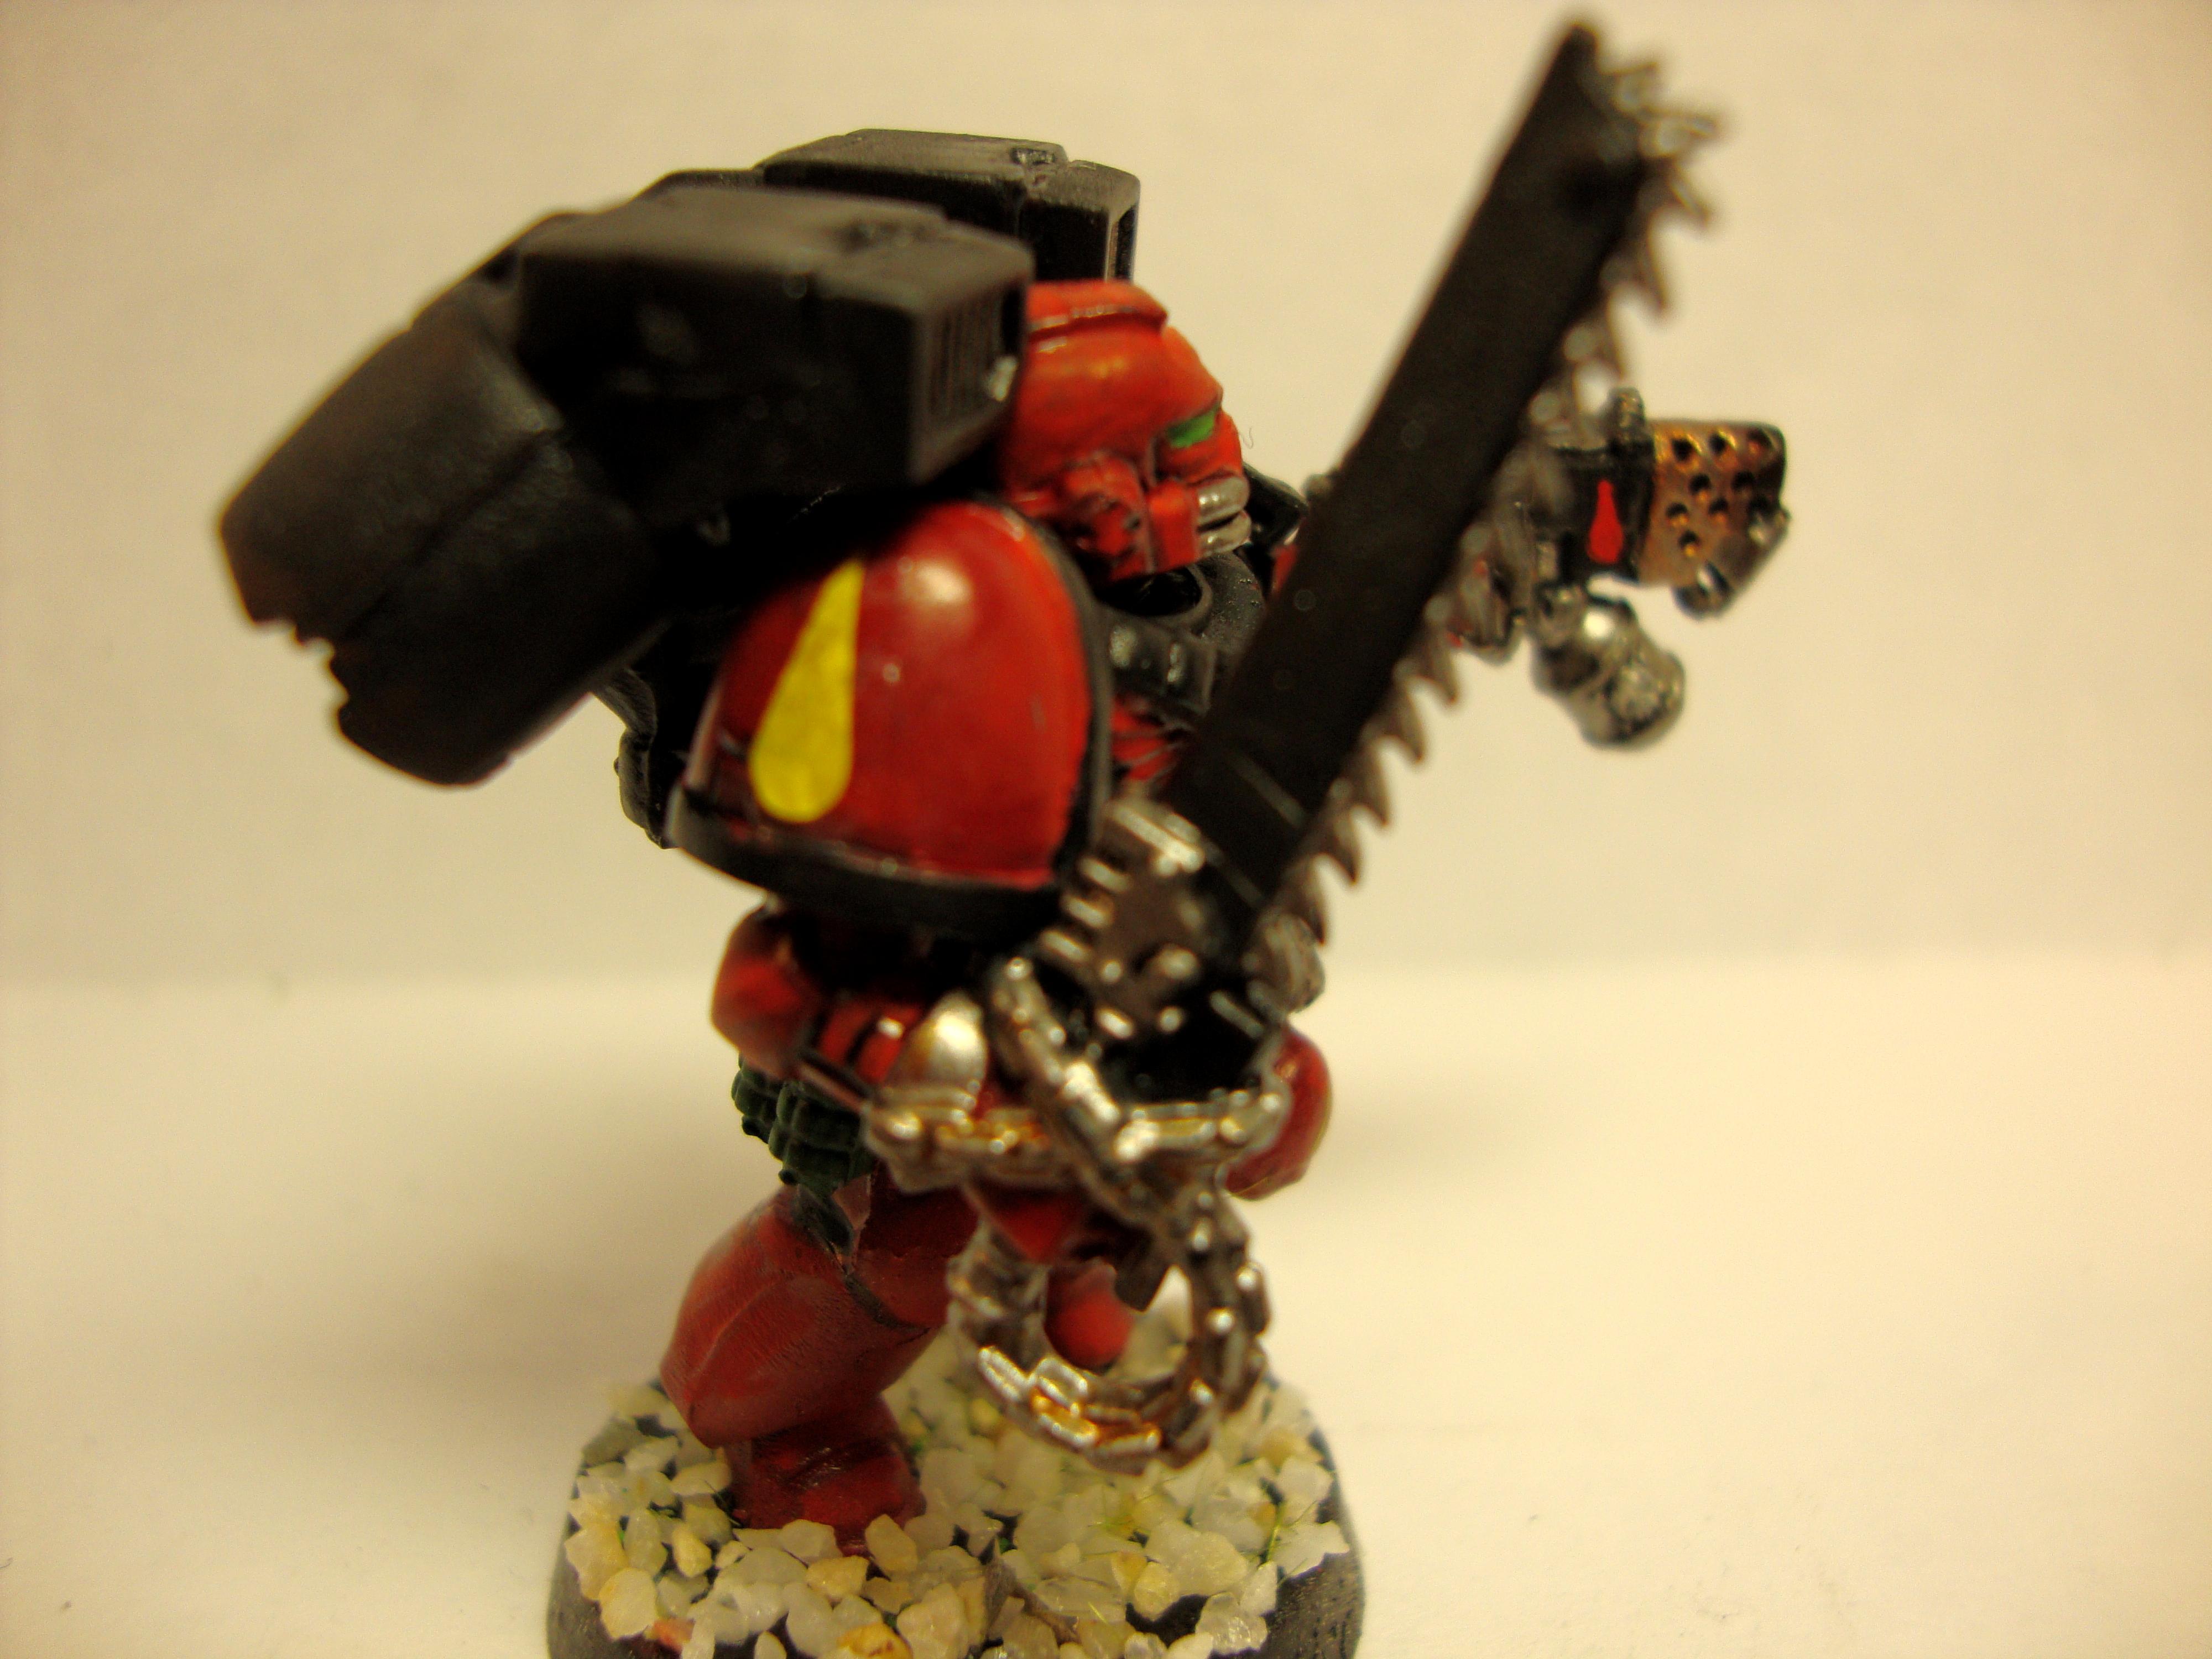 Blood Dragon, blood dragon specialist Enrick